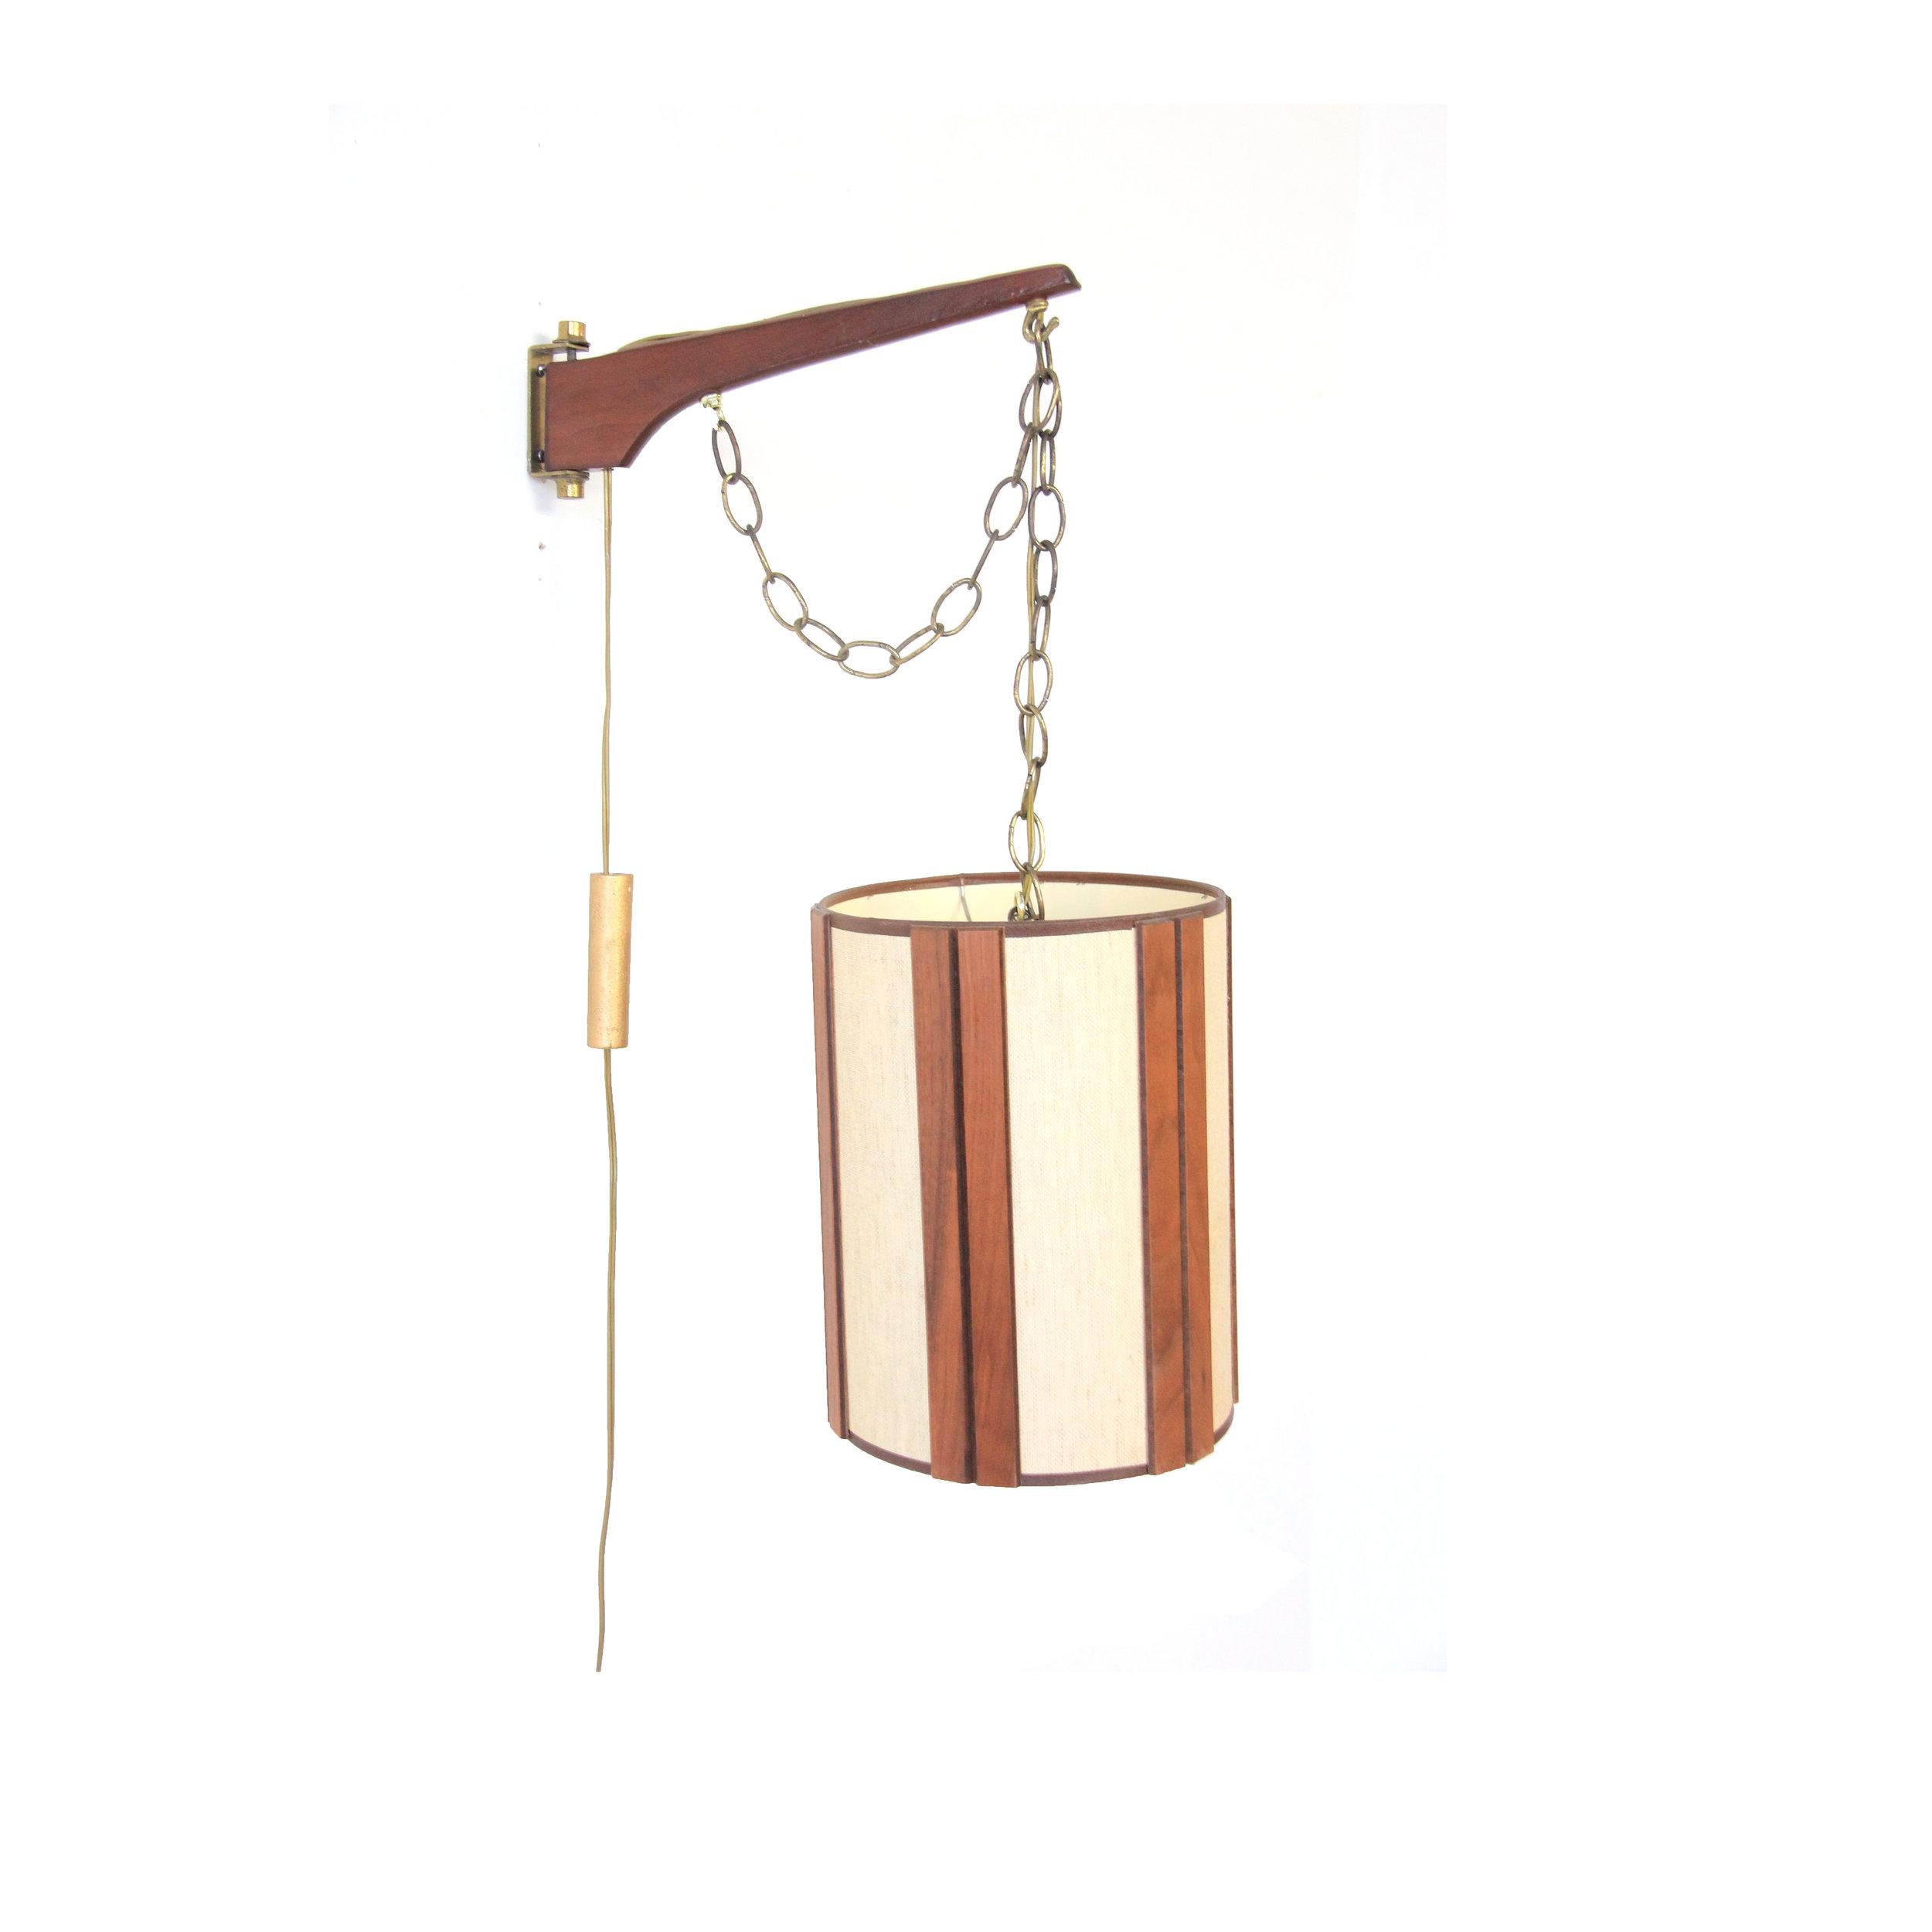 vintage hanging wood sconce.jpg